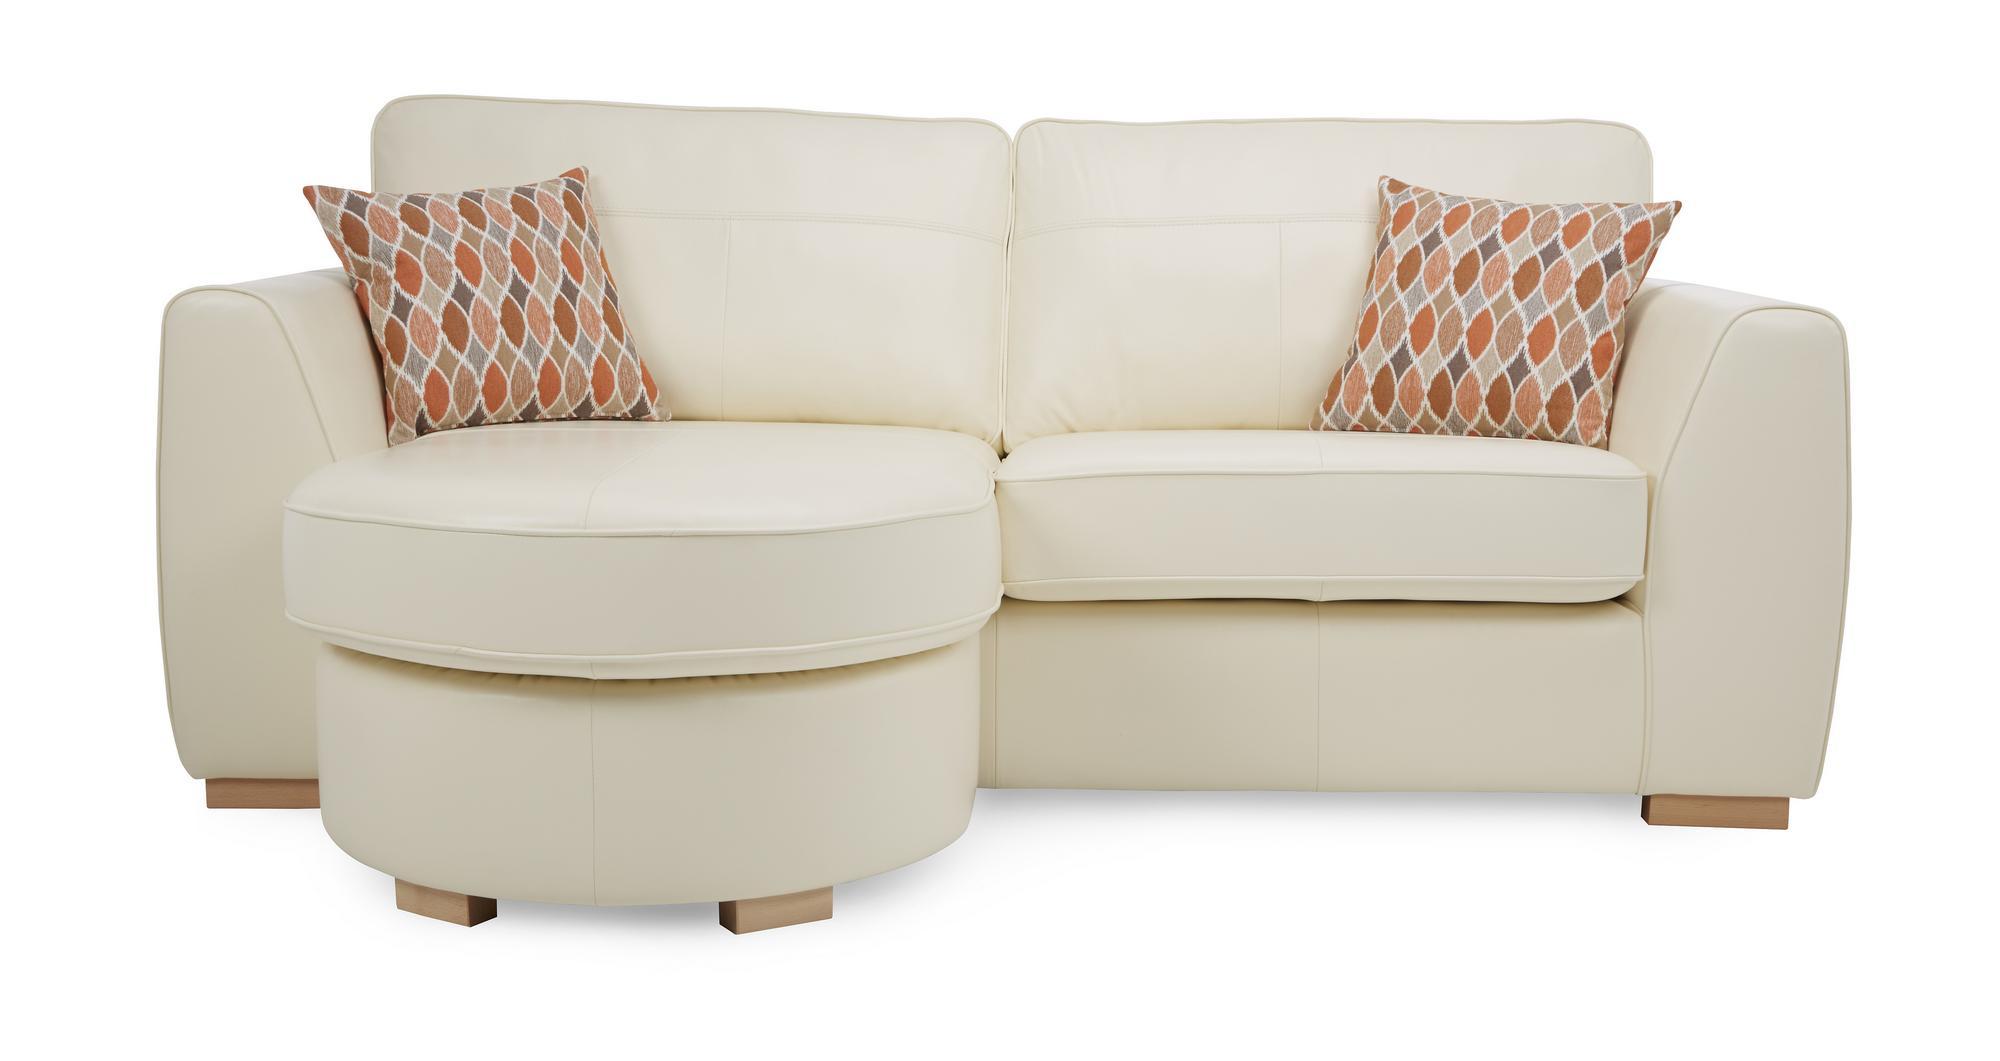 Dfs inez vanilla leather 4 seater lounger sofa chair storage stool 63568 ebay Dfs 4 seater leather sofa